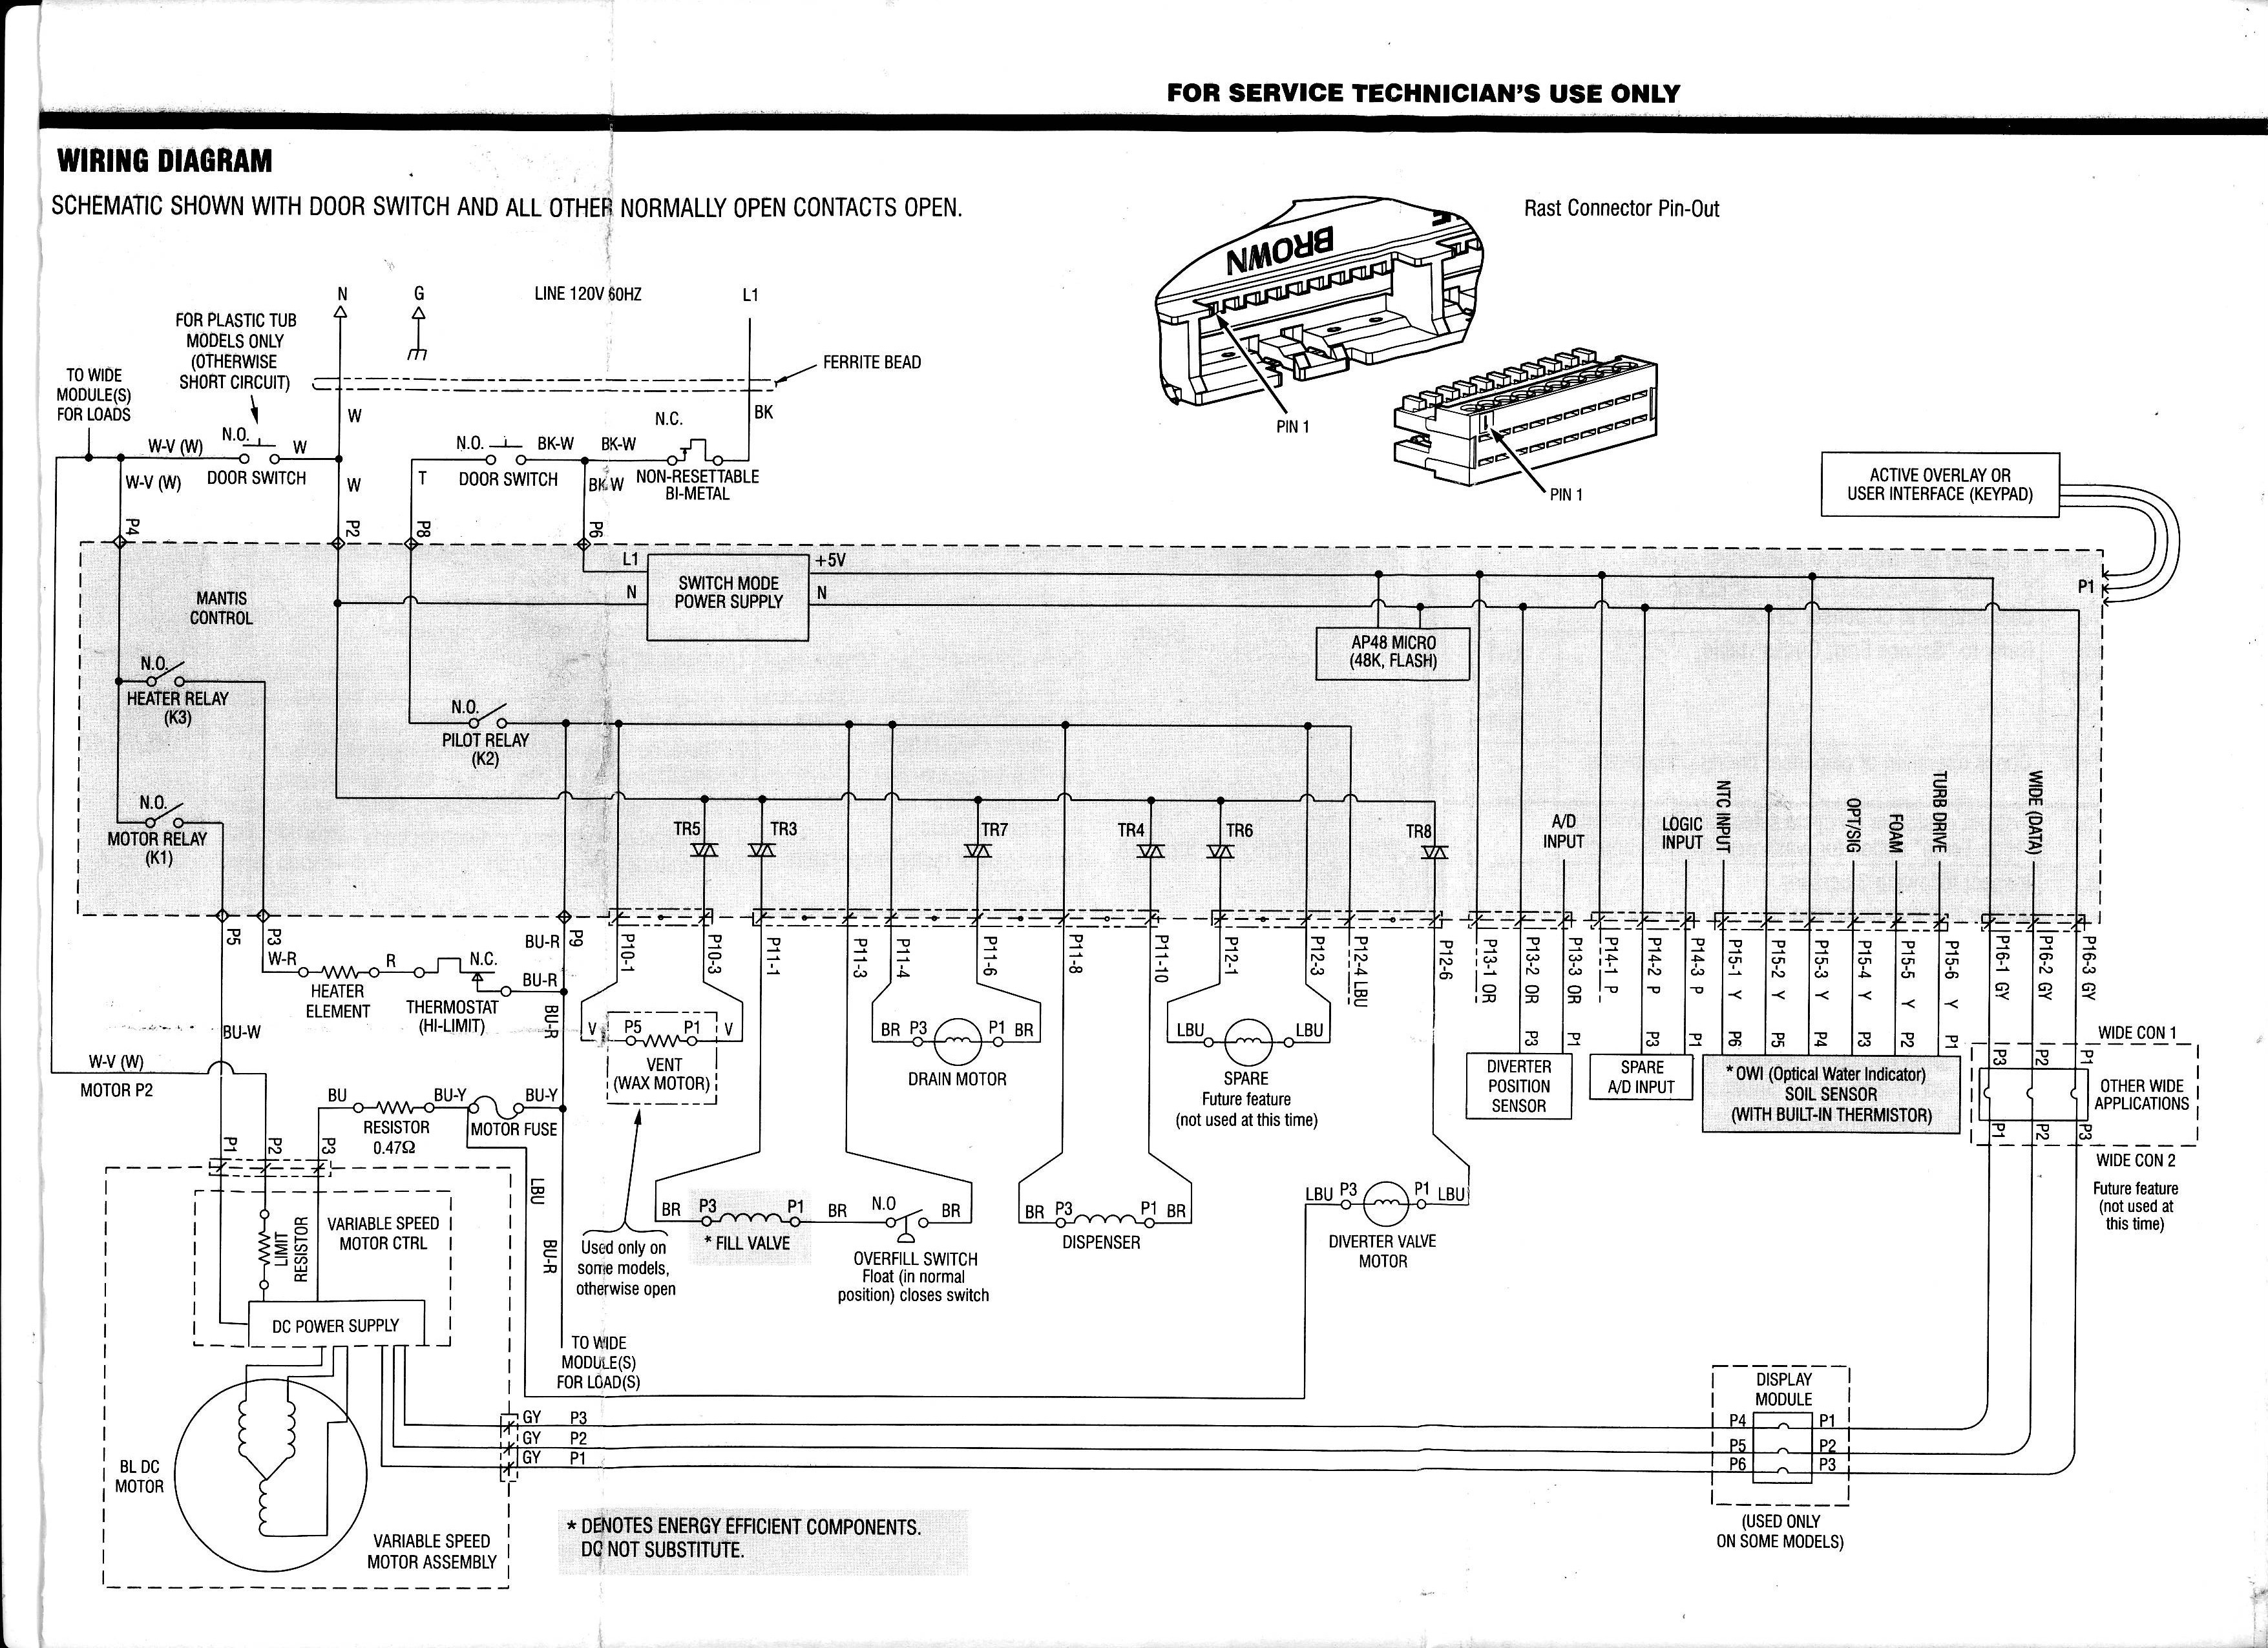 Kenmore Dryer Wiring Diagram Wiring Diagram for Kenmore Elite Refrigerator Best New Coachedby Of Kenmore Dryer Wiring Diagram